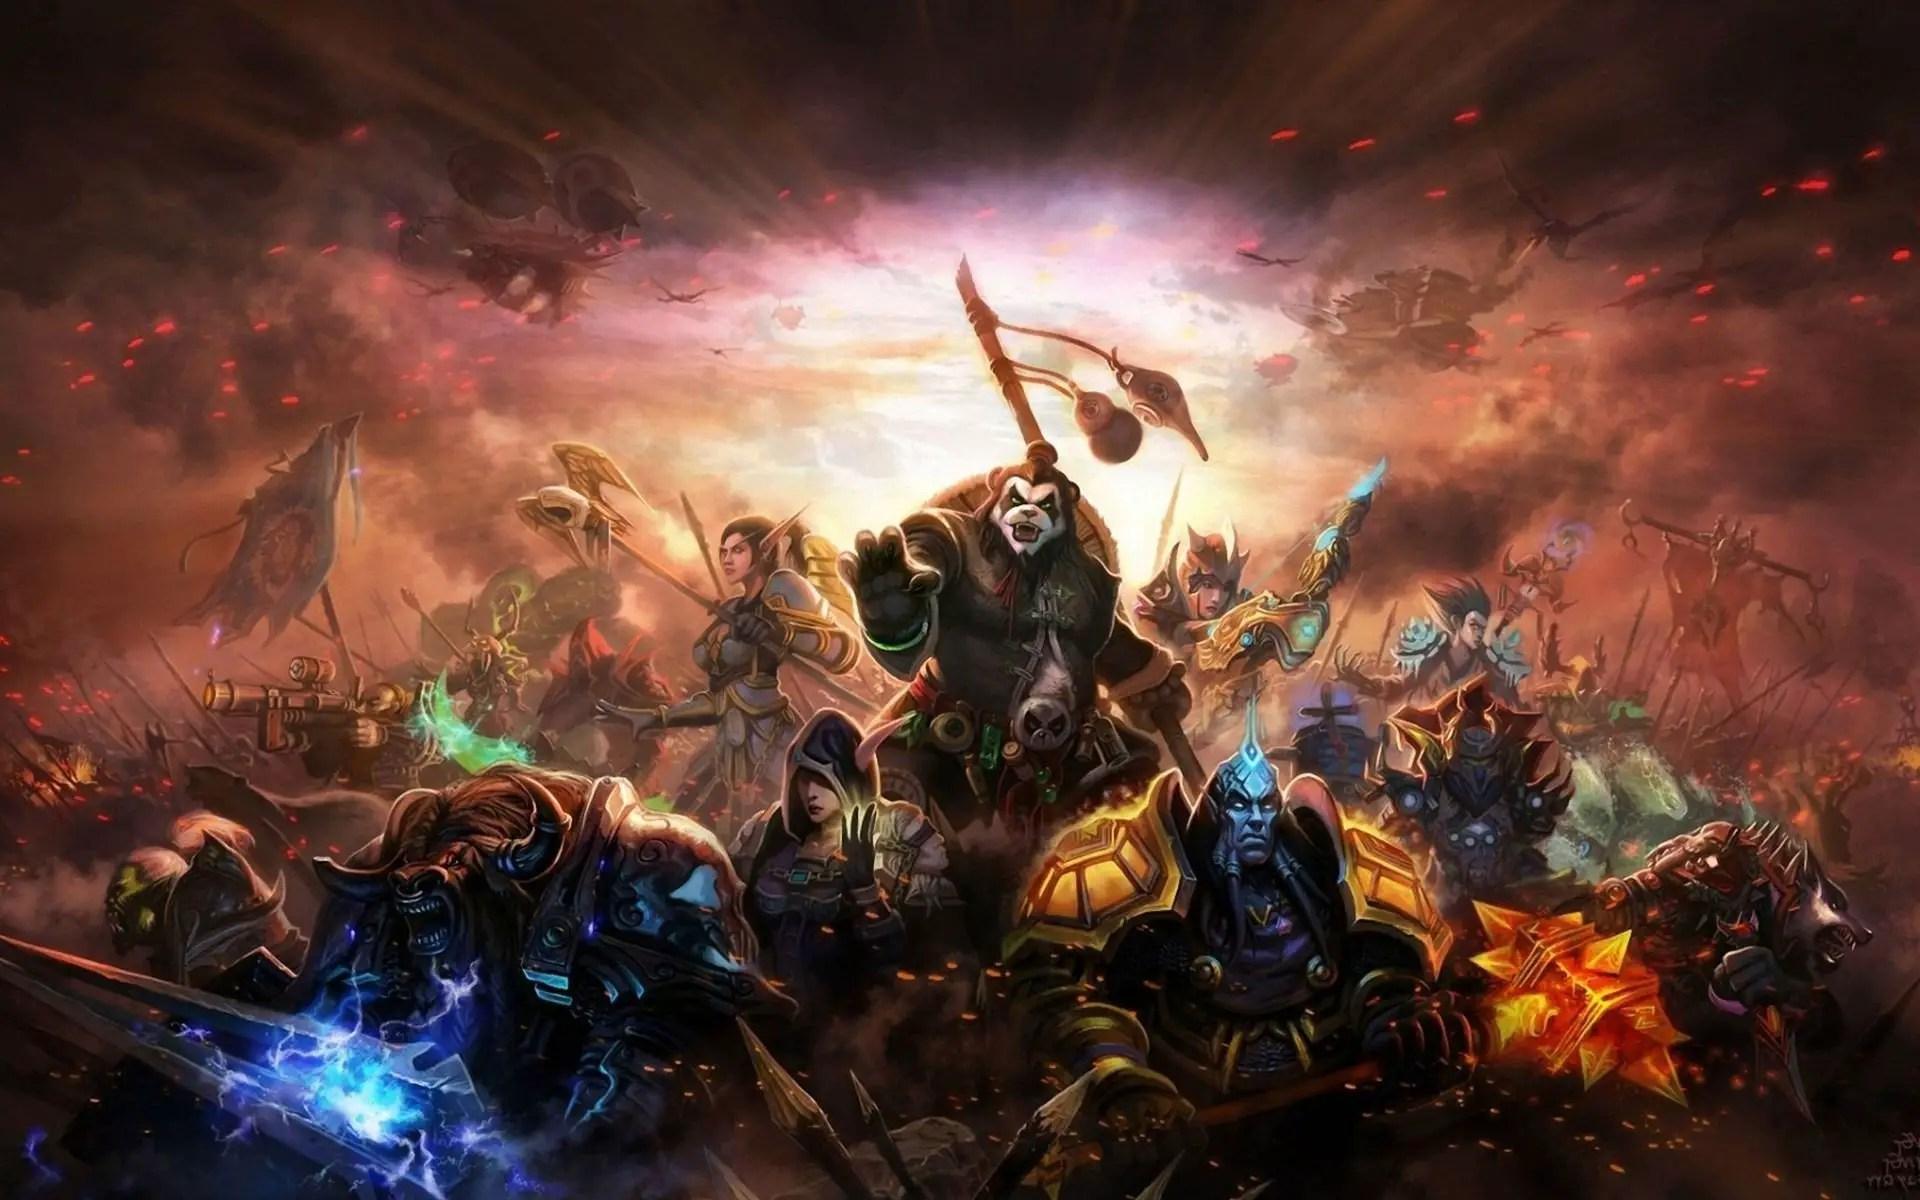 Warcraft 3 Panda Wallpaper Warcraft 3 Tools